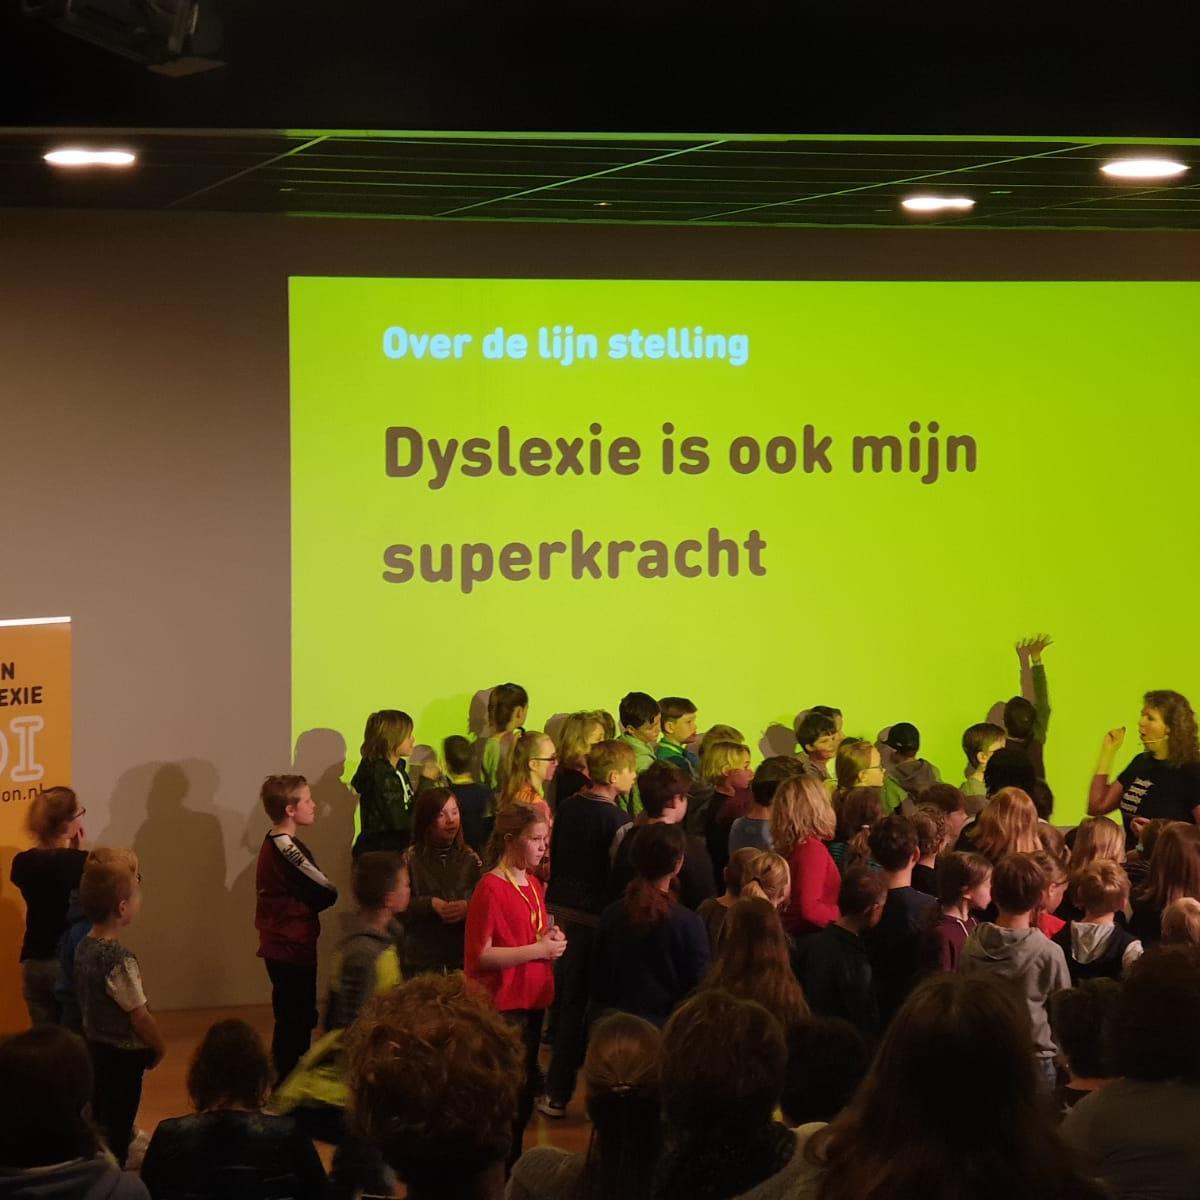 Dyslexie mijn superkracht